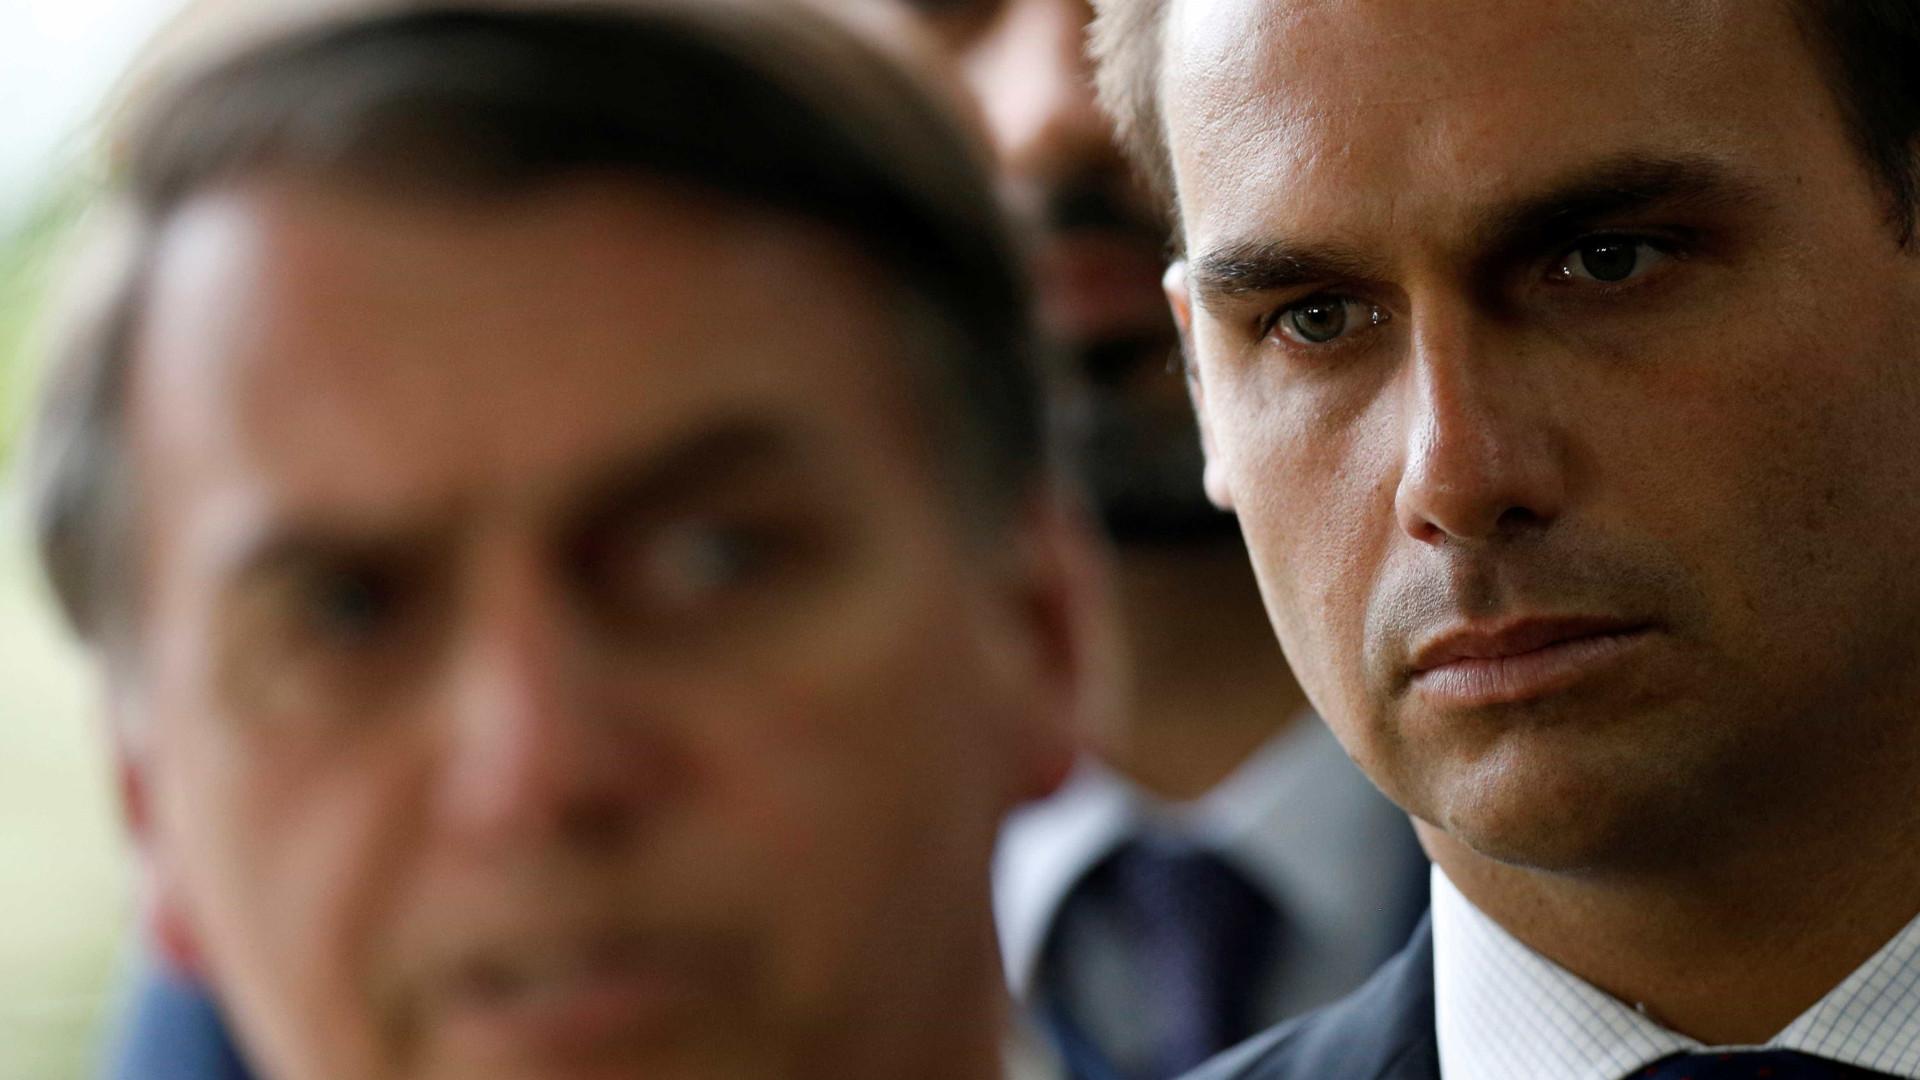 PSL analisa expulsão de Eduardo Bolsonaro